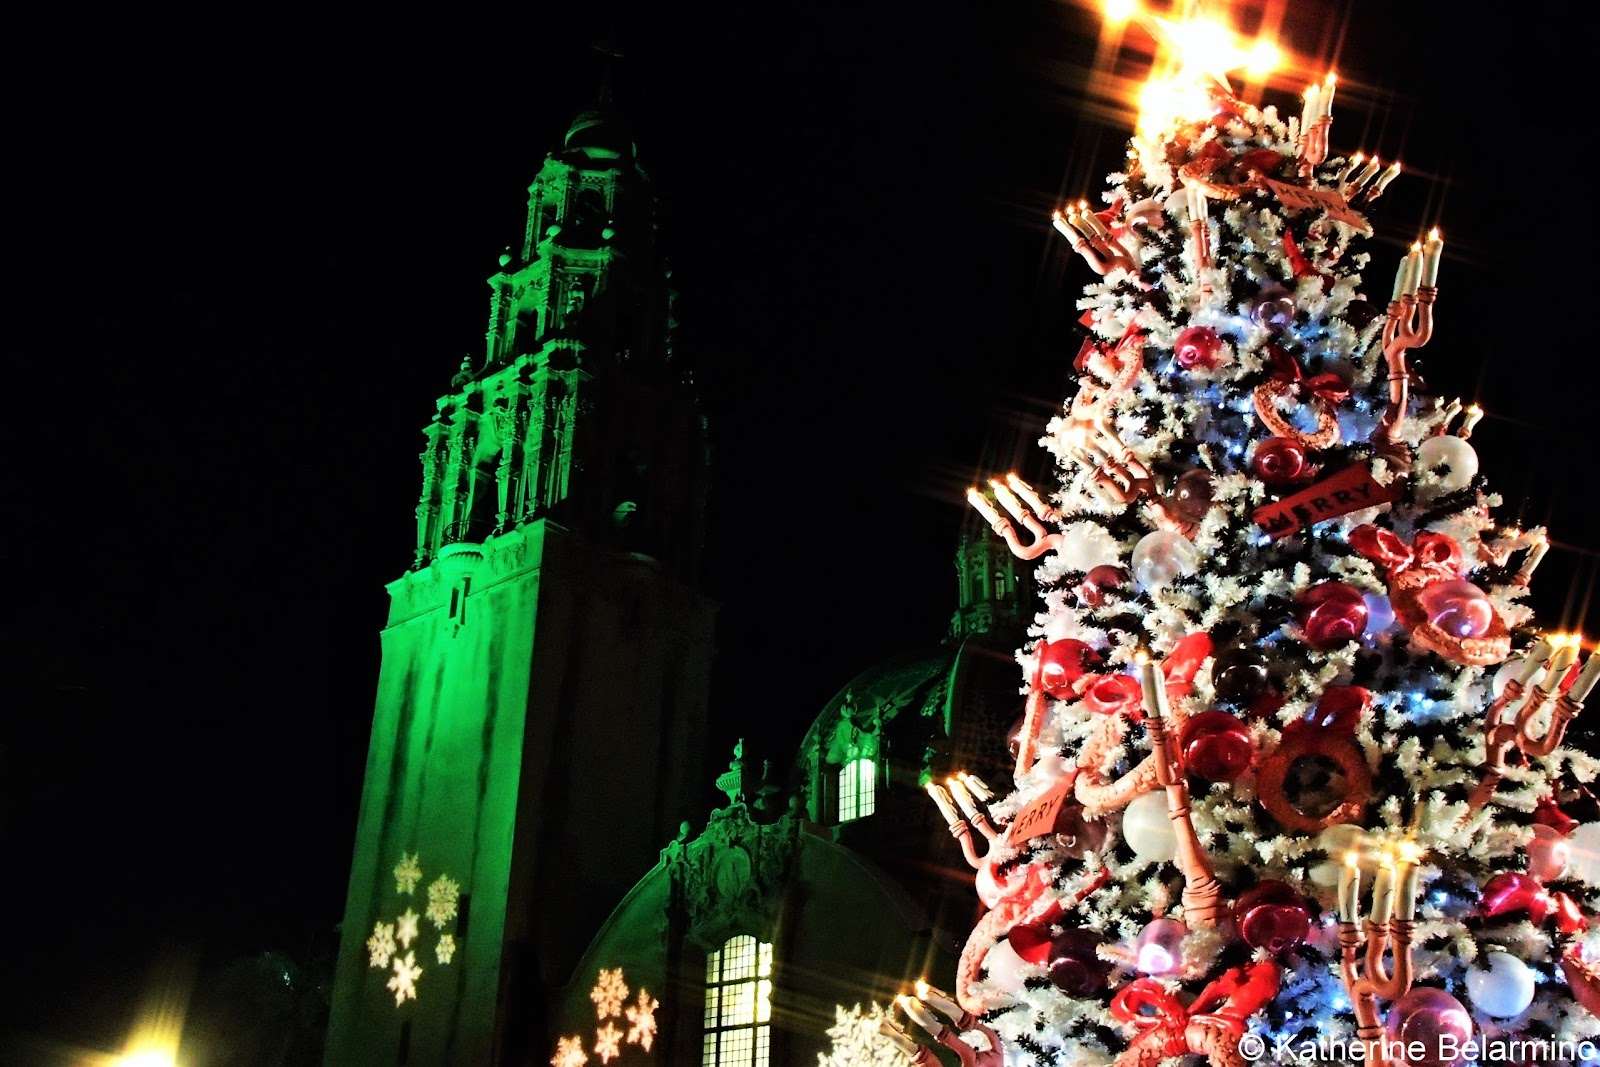 grinch christmas tree balboa park san diego - Balboa Park Christmas Lights